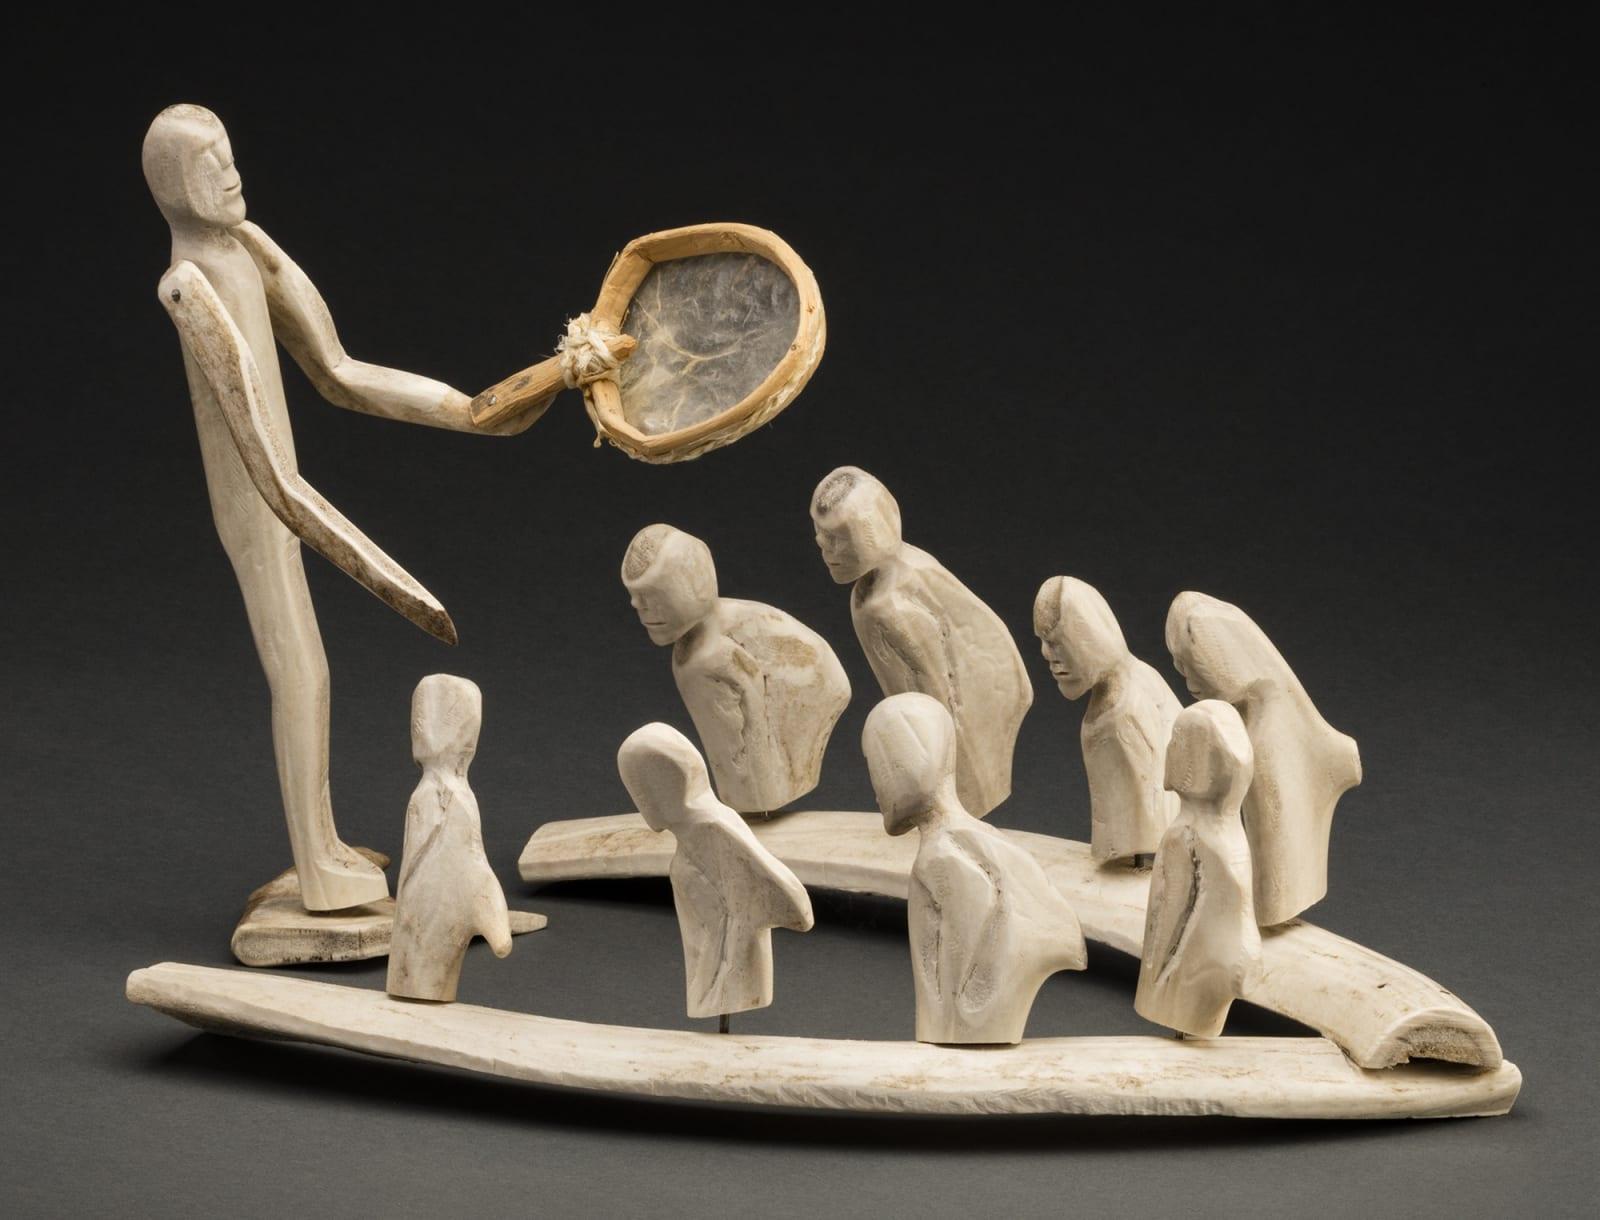 Lot 21 LUKE IKSIKTAARYUK (1909-1977) QAMANI'TUAQ (BAKER LAKE) Drum Dance Scene, early 1970s antler, wood, caribou heart tissue, cord, and metal, dimensions variable: 10 x 14.25 x 10 in (25.4 x 36.2 x 25.4 cm) Estimate: $25,000 — $35,000